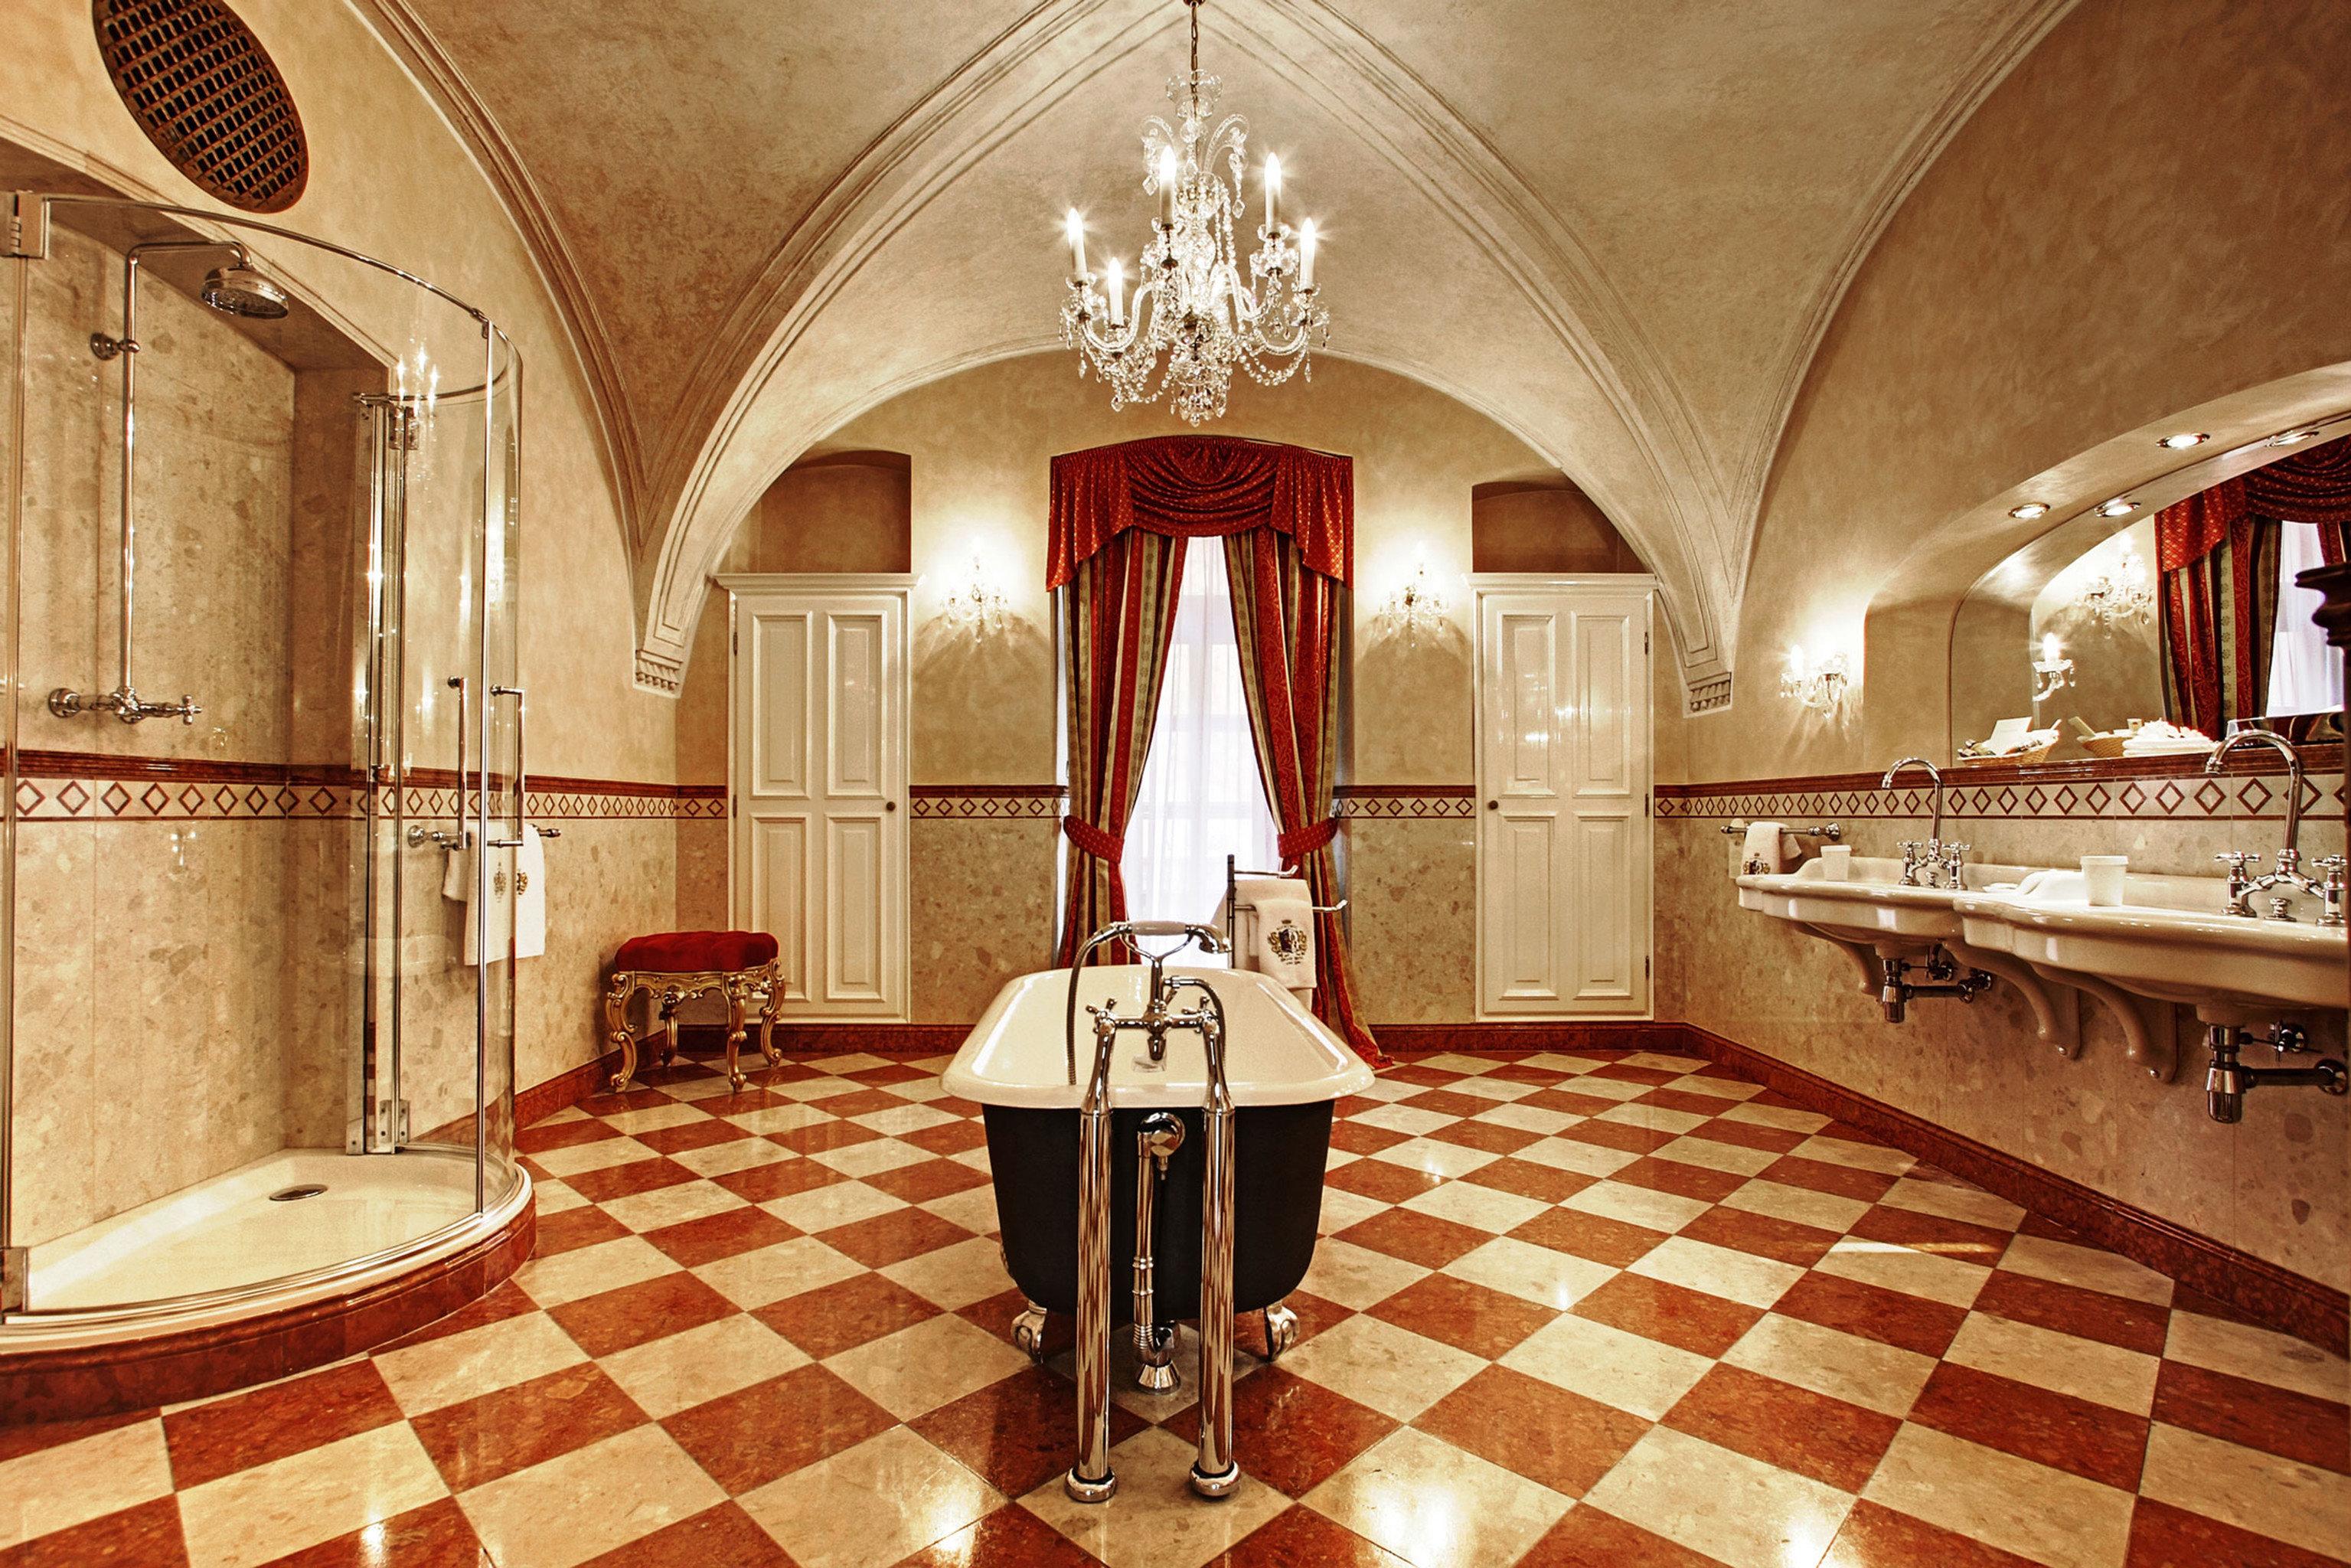 Bath Historic Luxury building Lobby rug mansion palace hall chapel synagogue flooring tile tiled